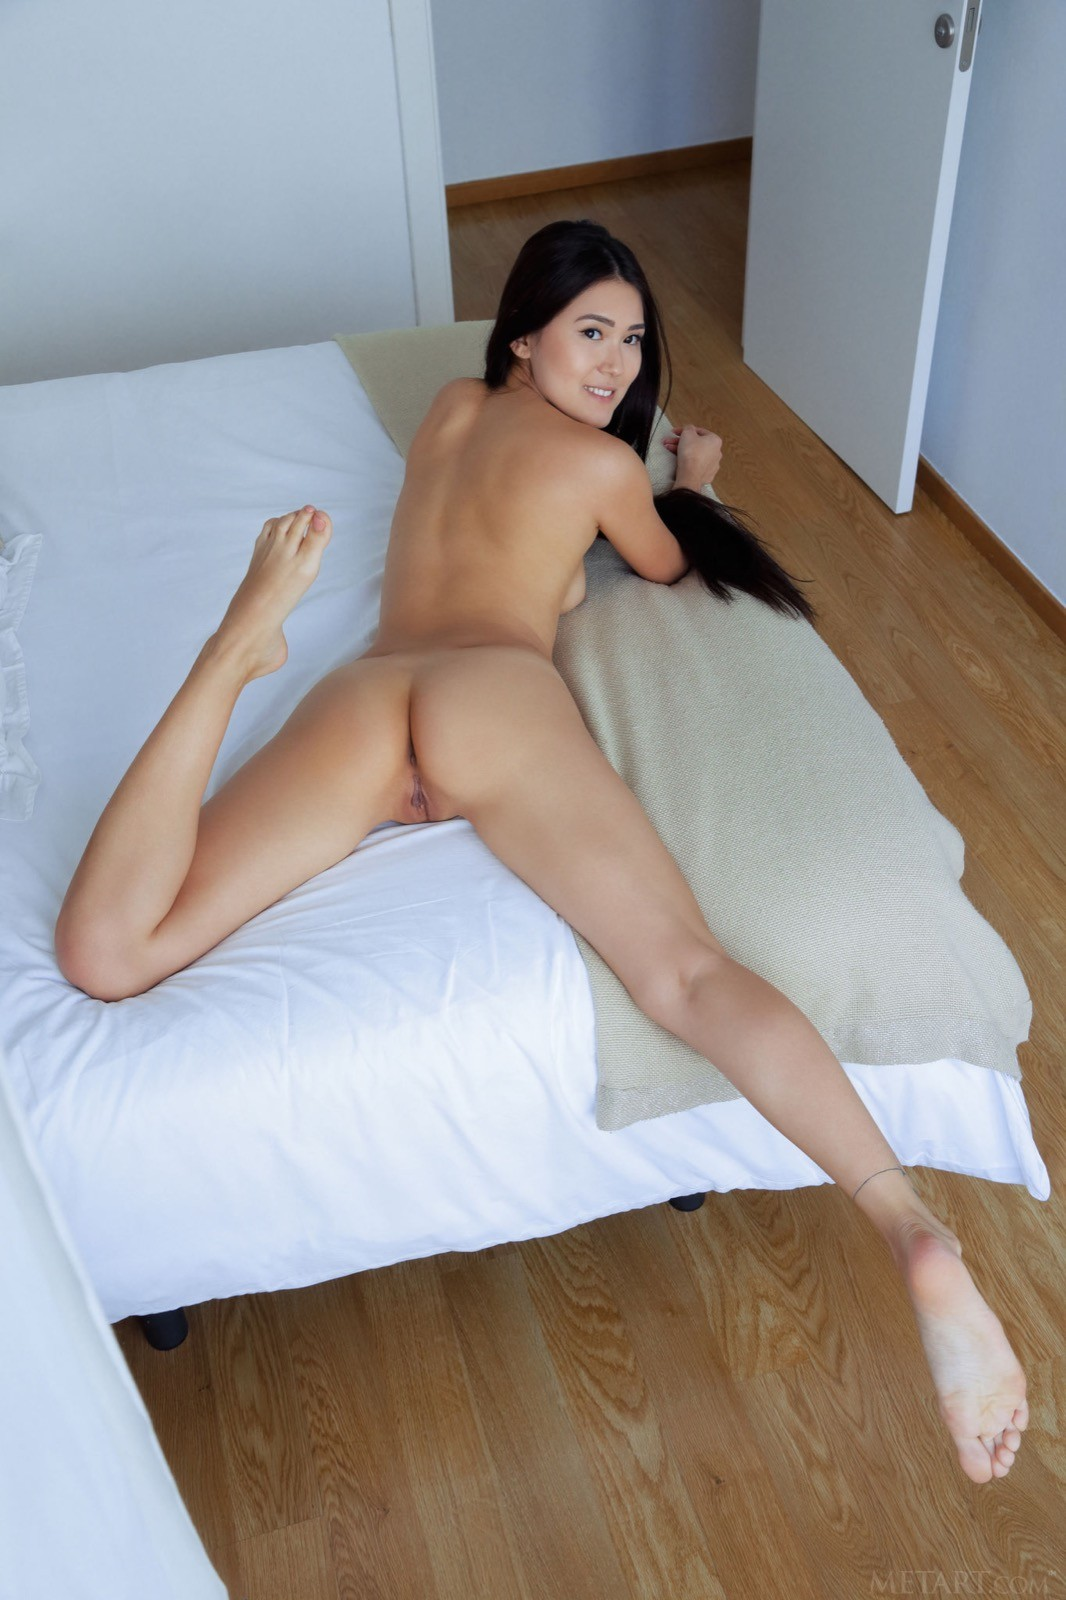 Голая кореянка лежит на кровати - фото